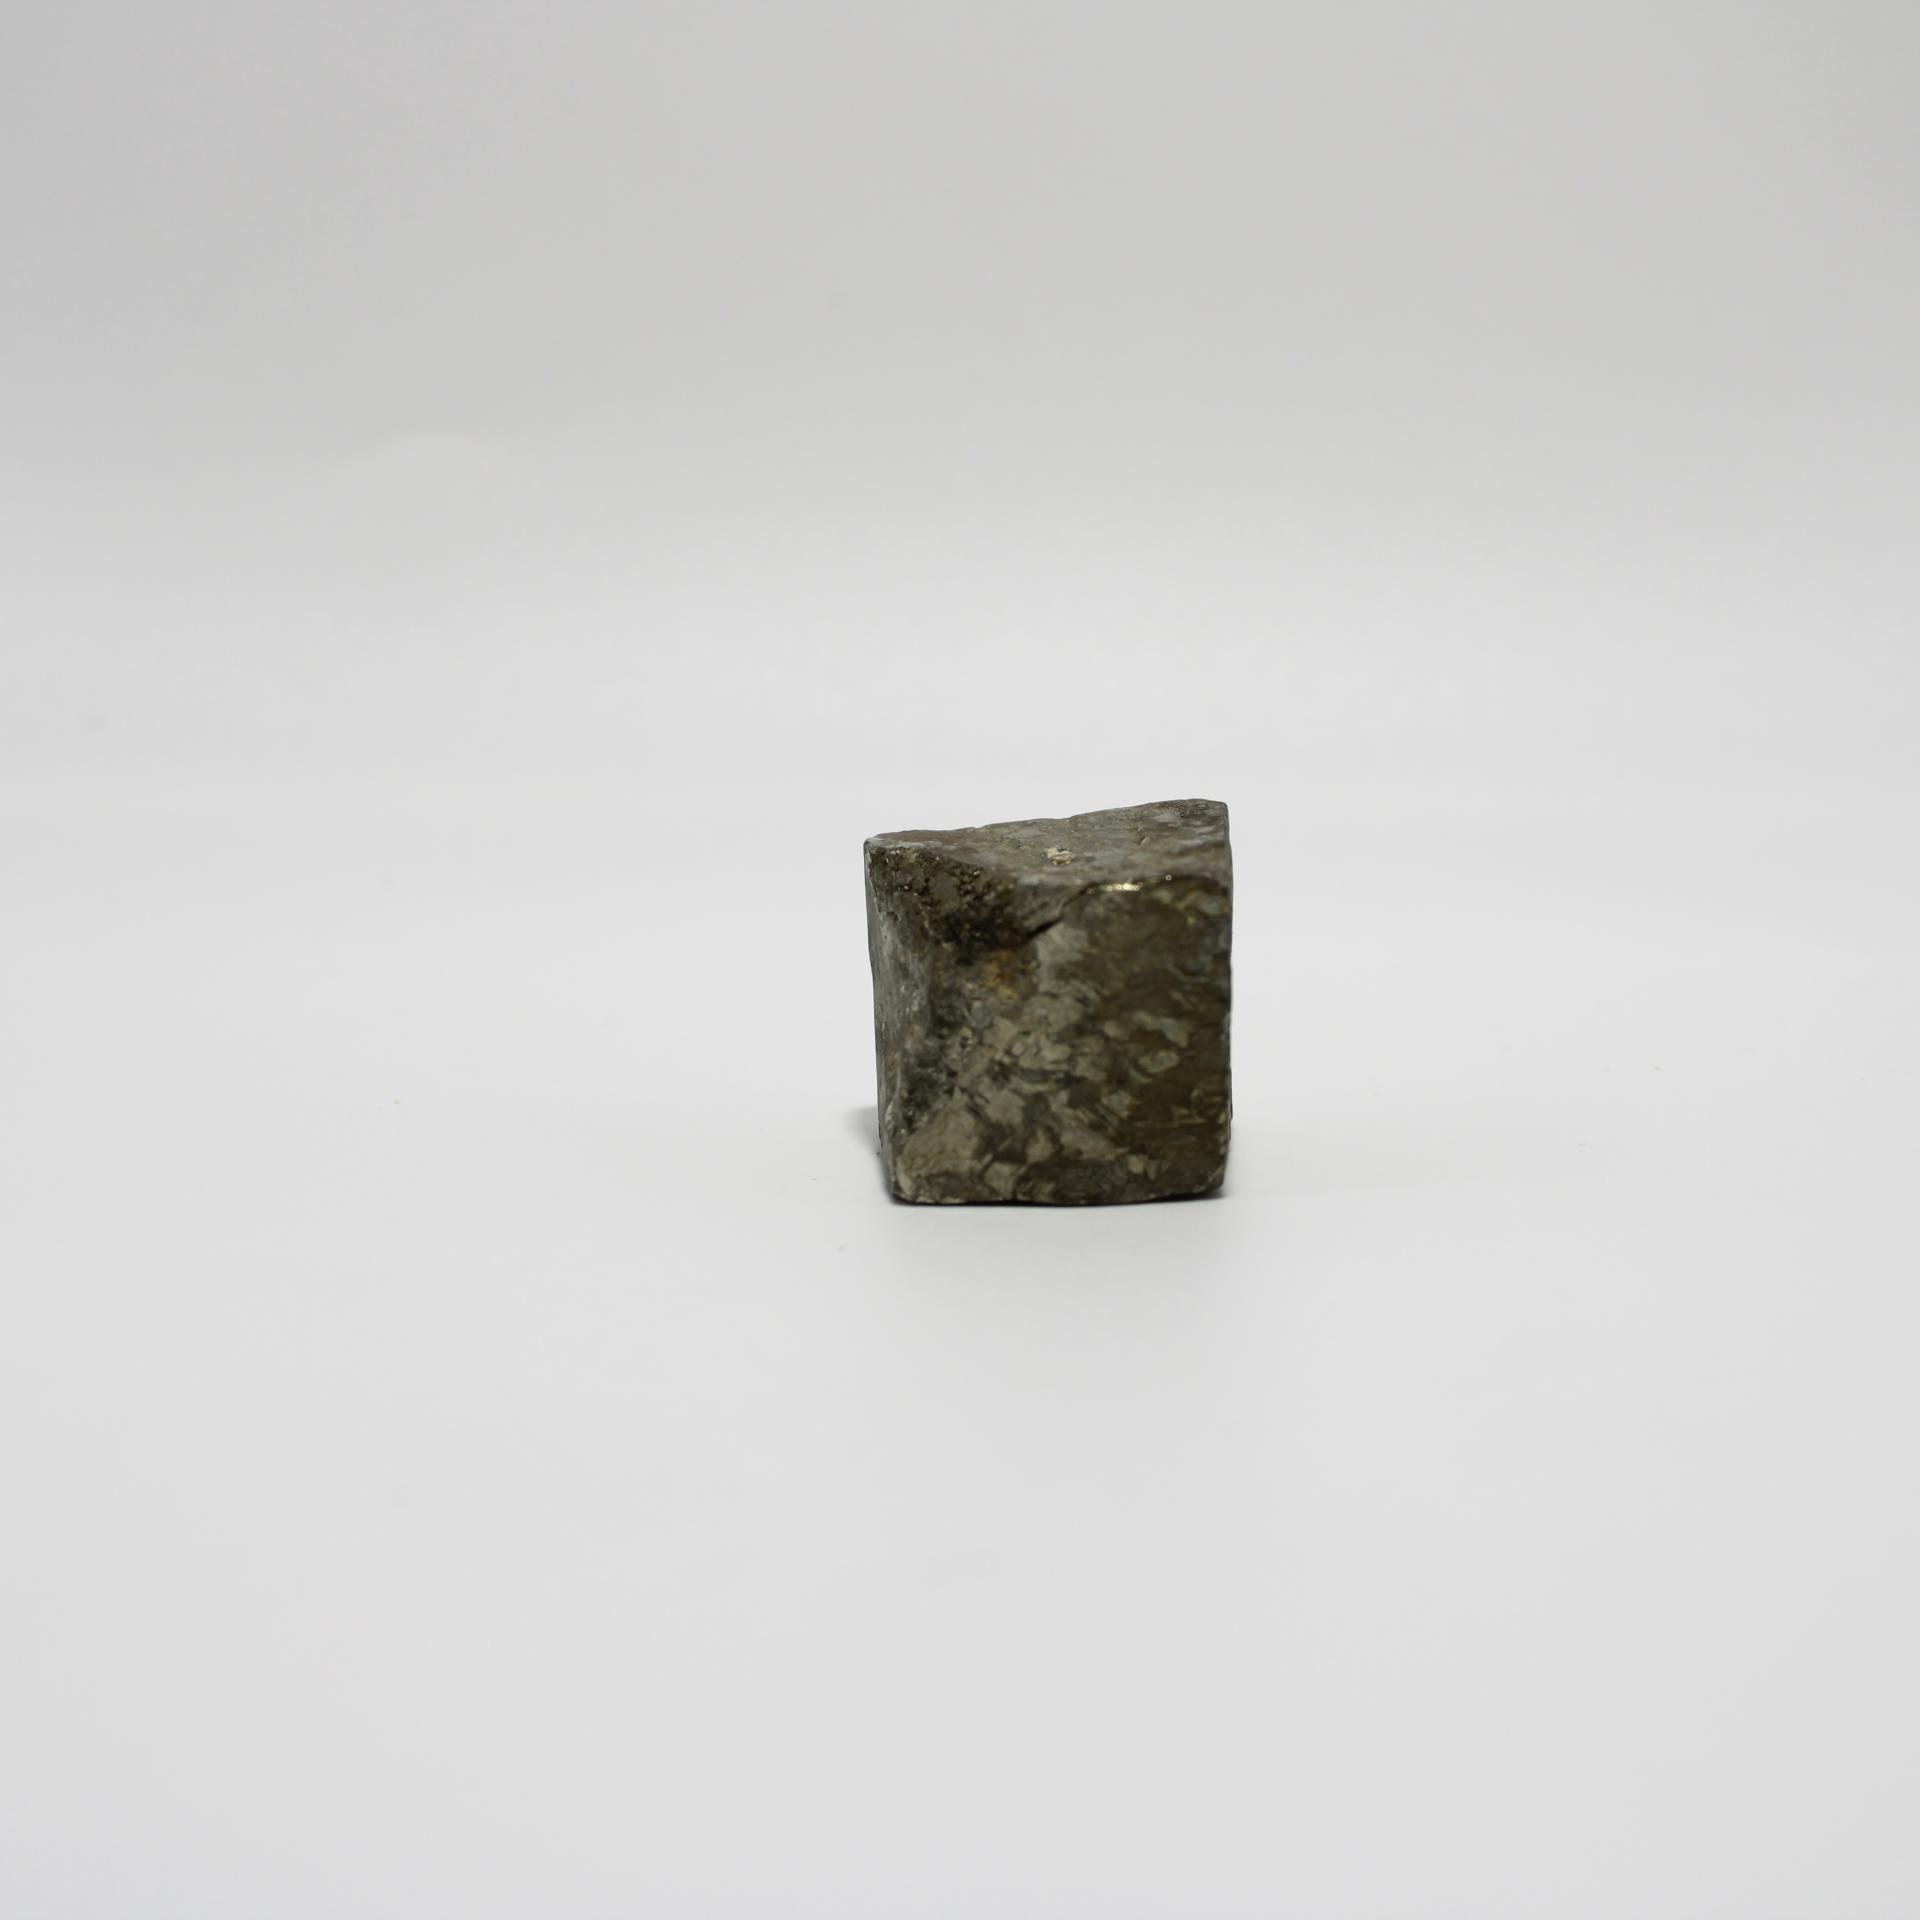 I69 pyritecube 1